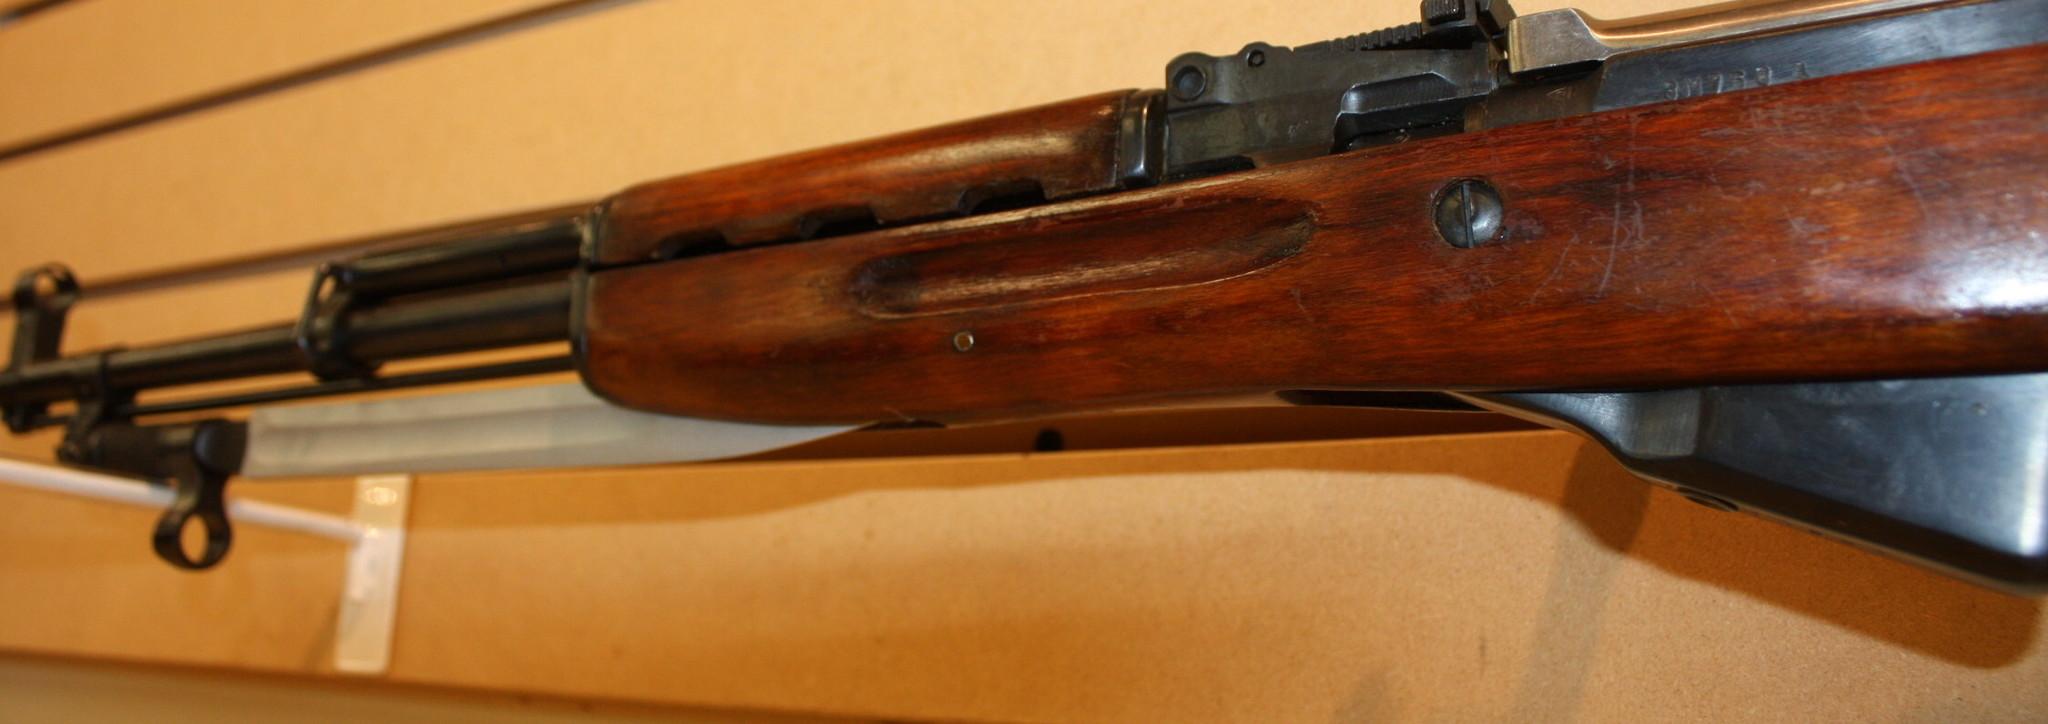 SKS Russian Rifle (1954r) w/ Bayonet - Poco Military